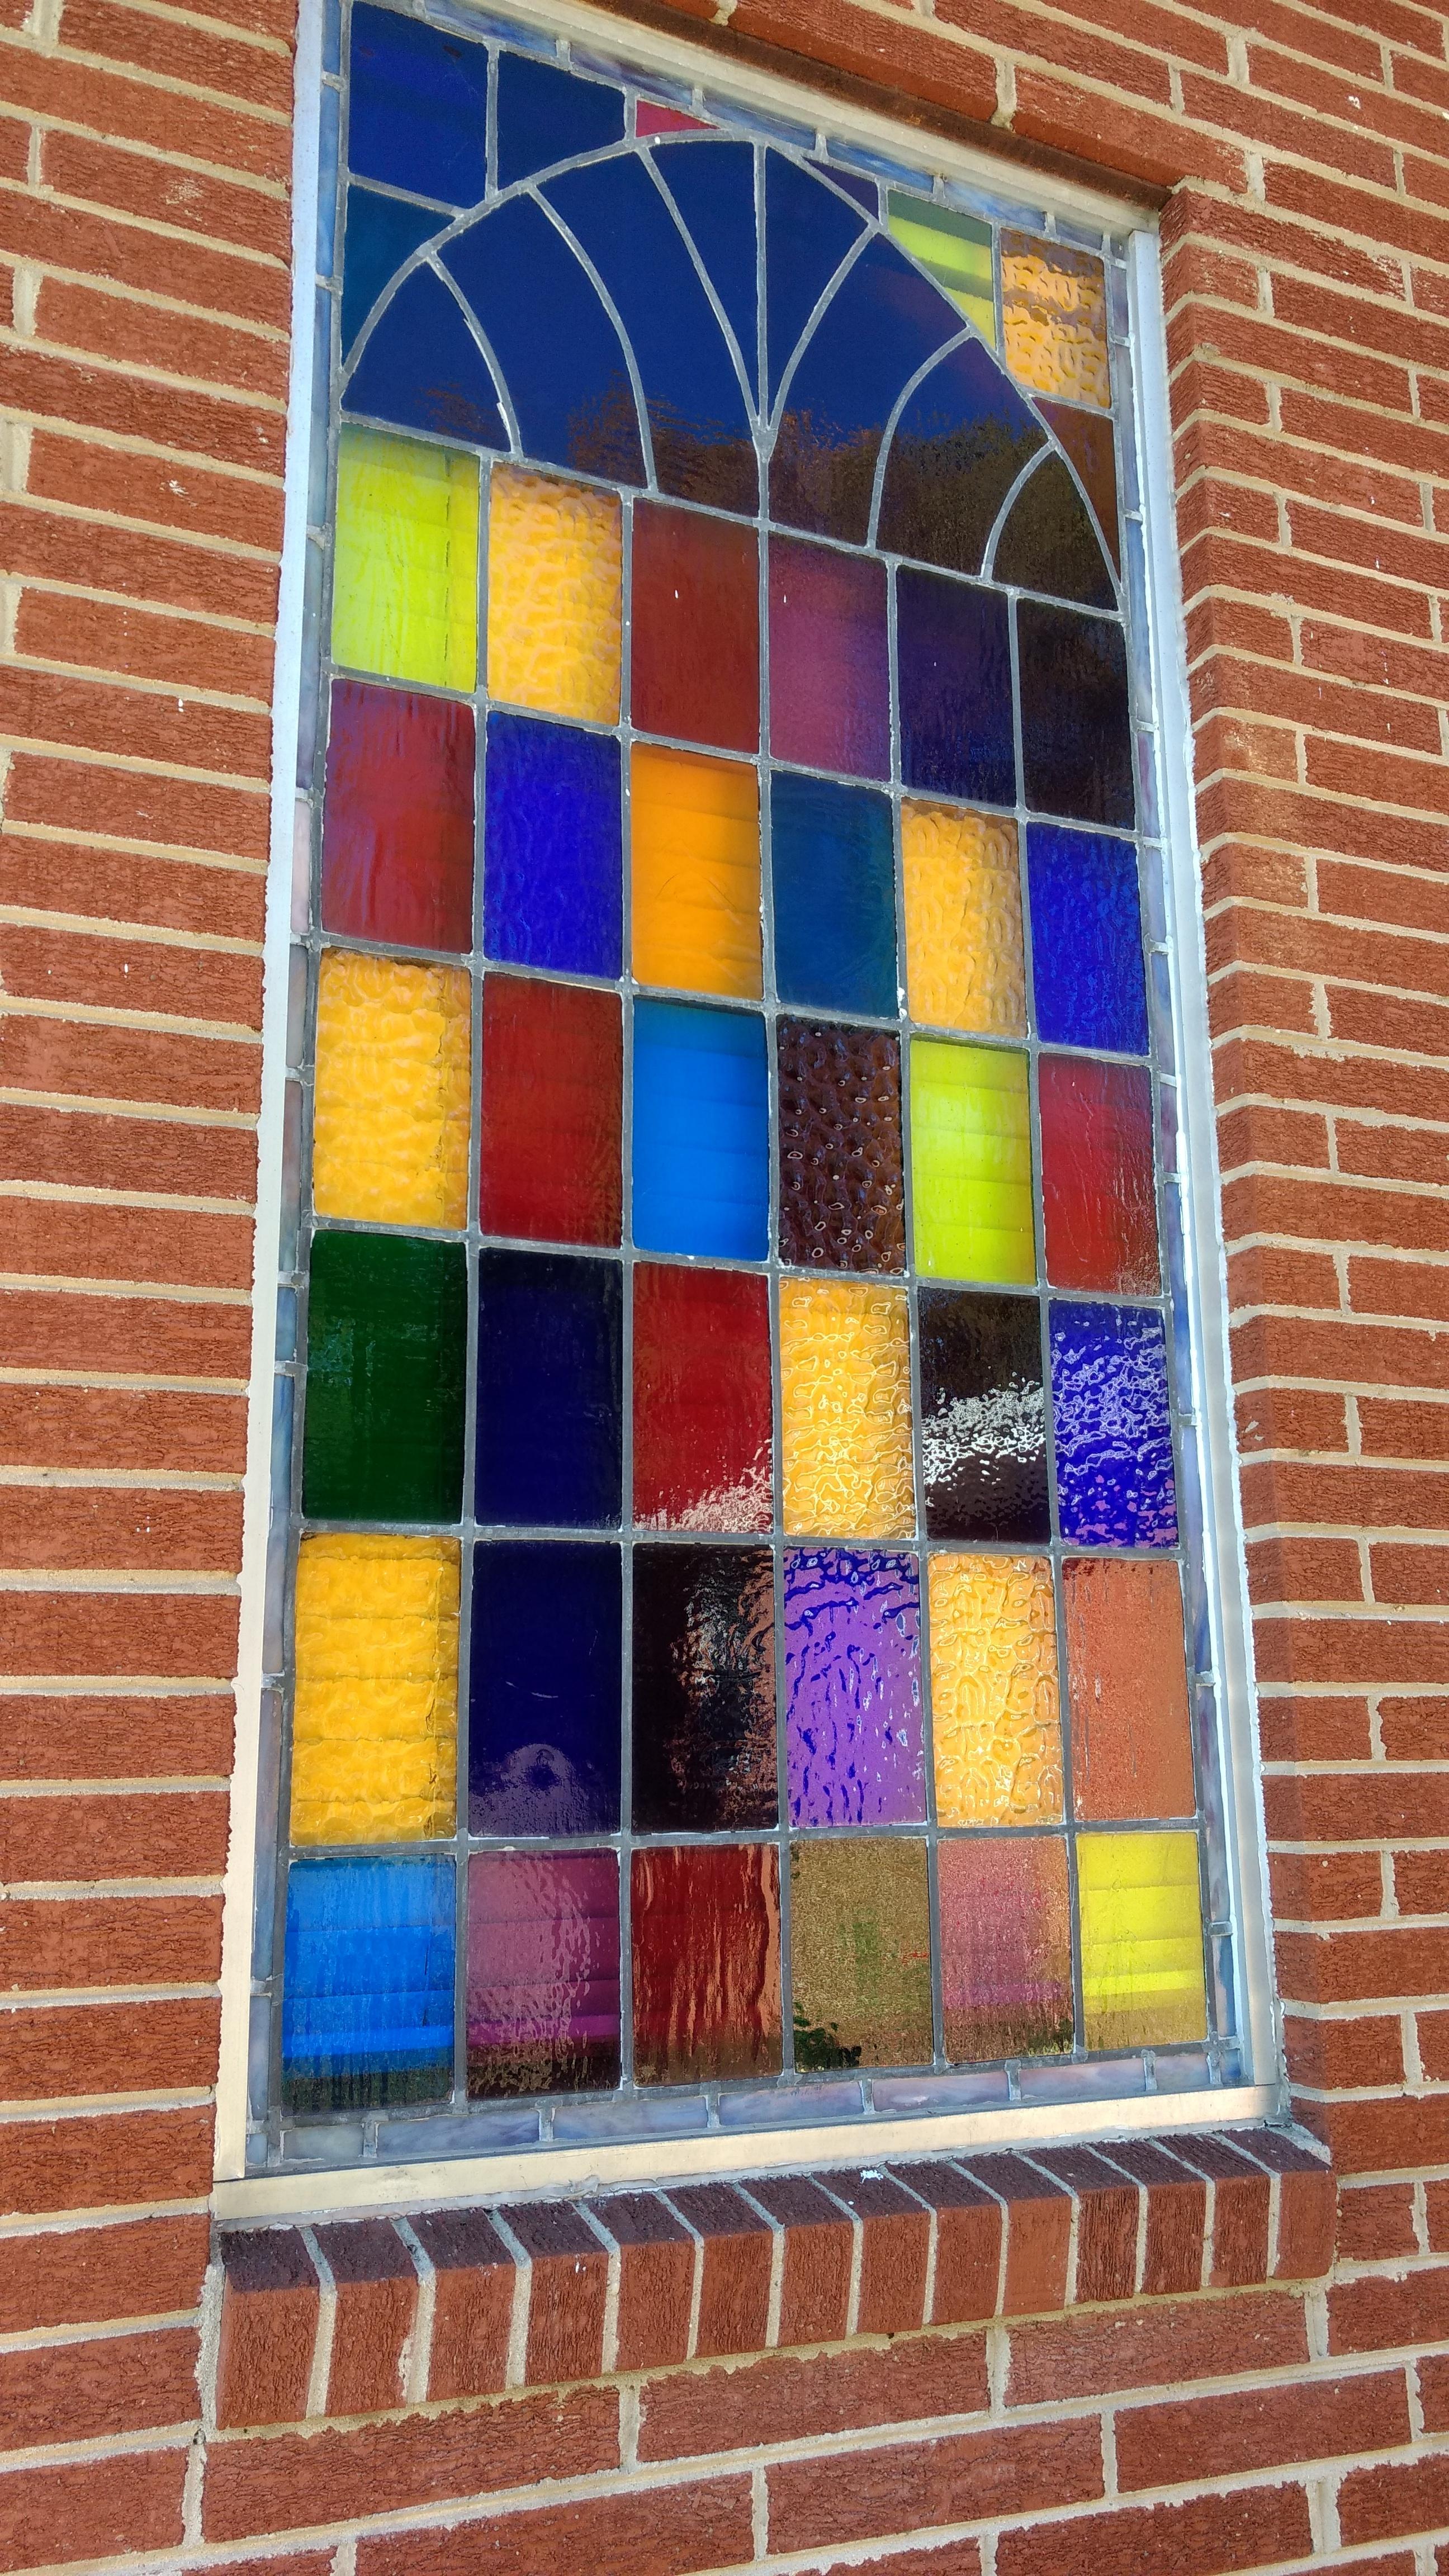 ventana vaso pared patrn color fachada azul material vitral circulo diseo de interiores textil art diseo